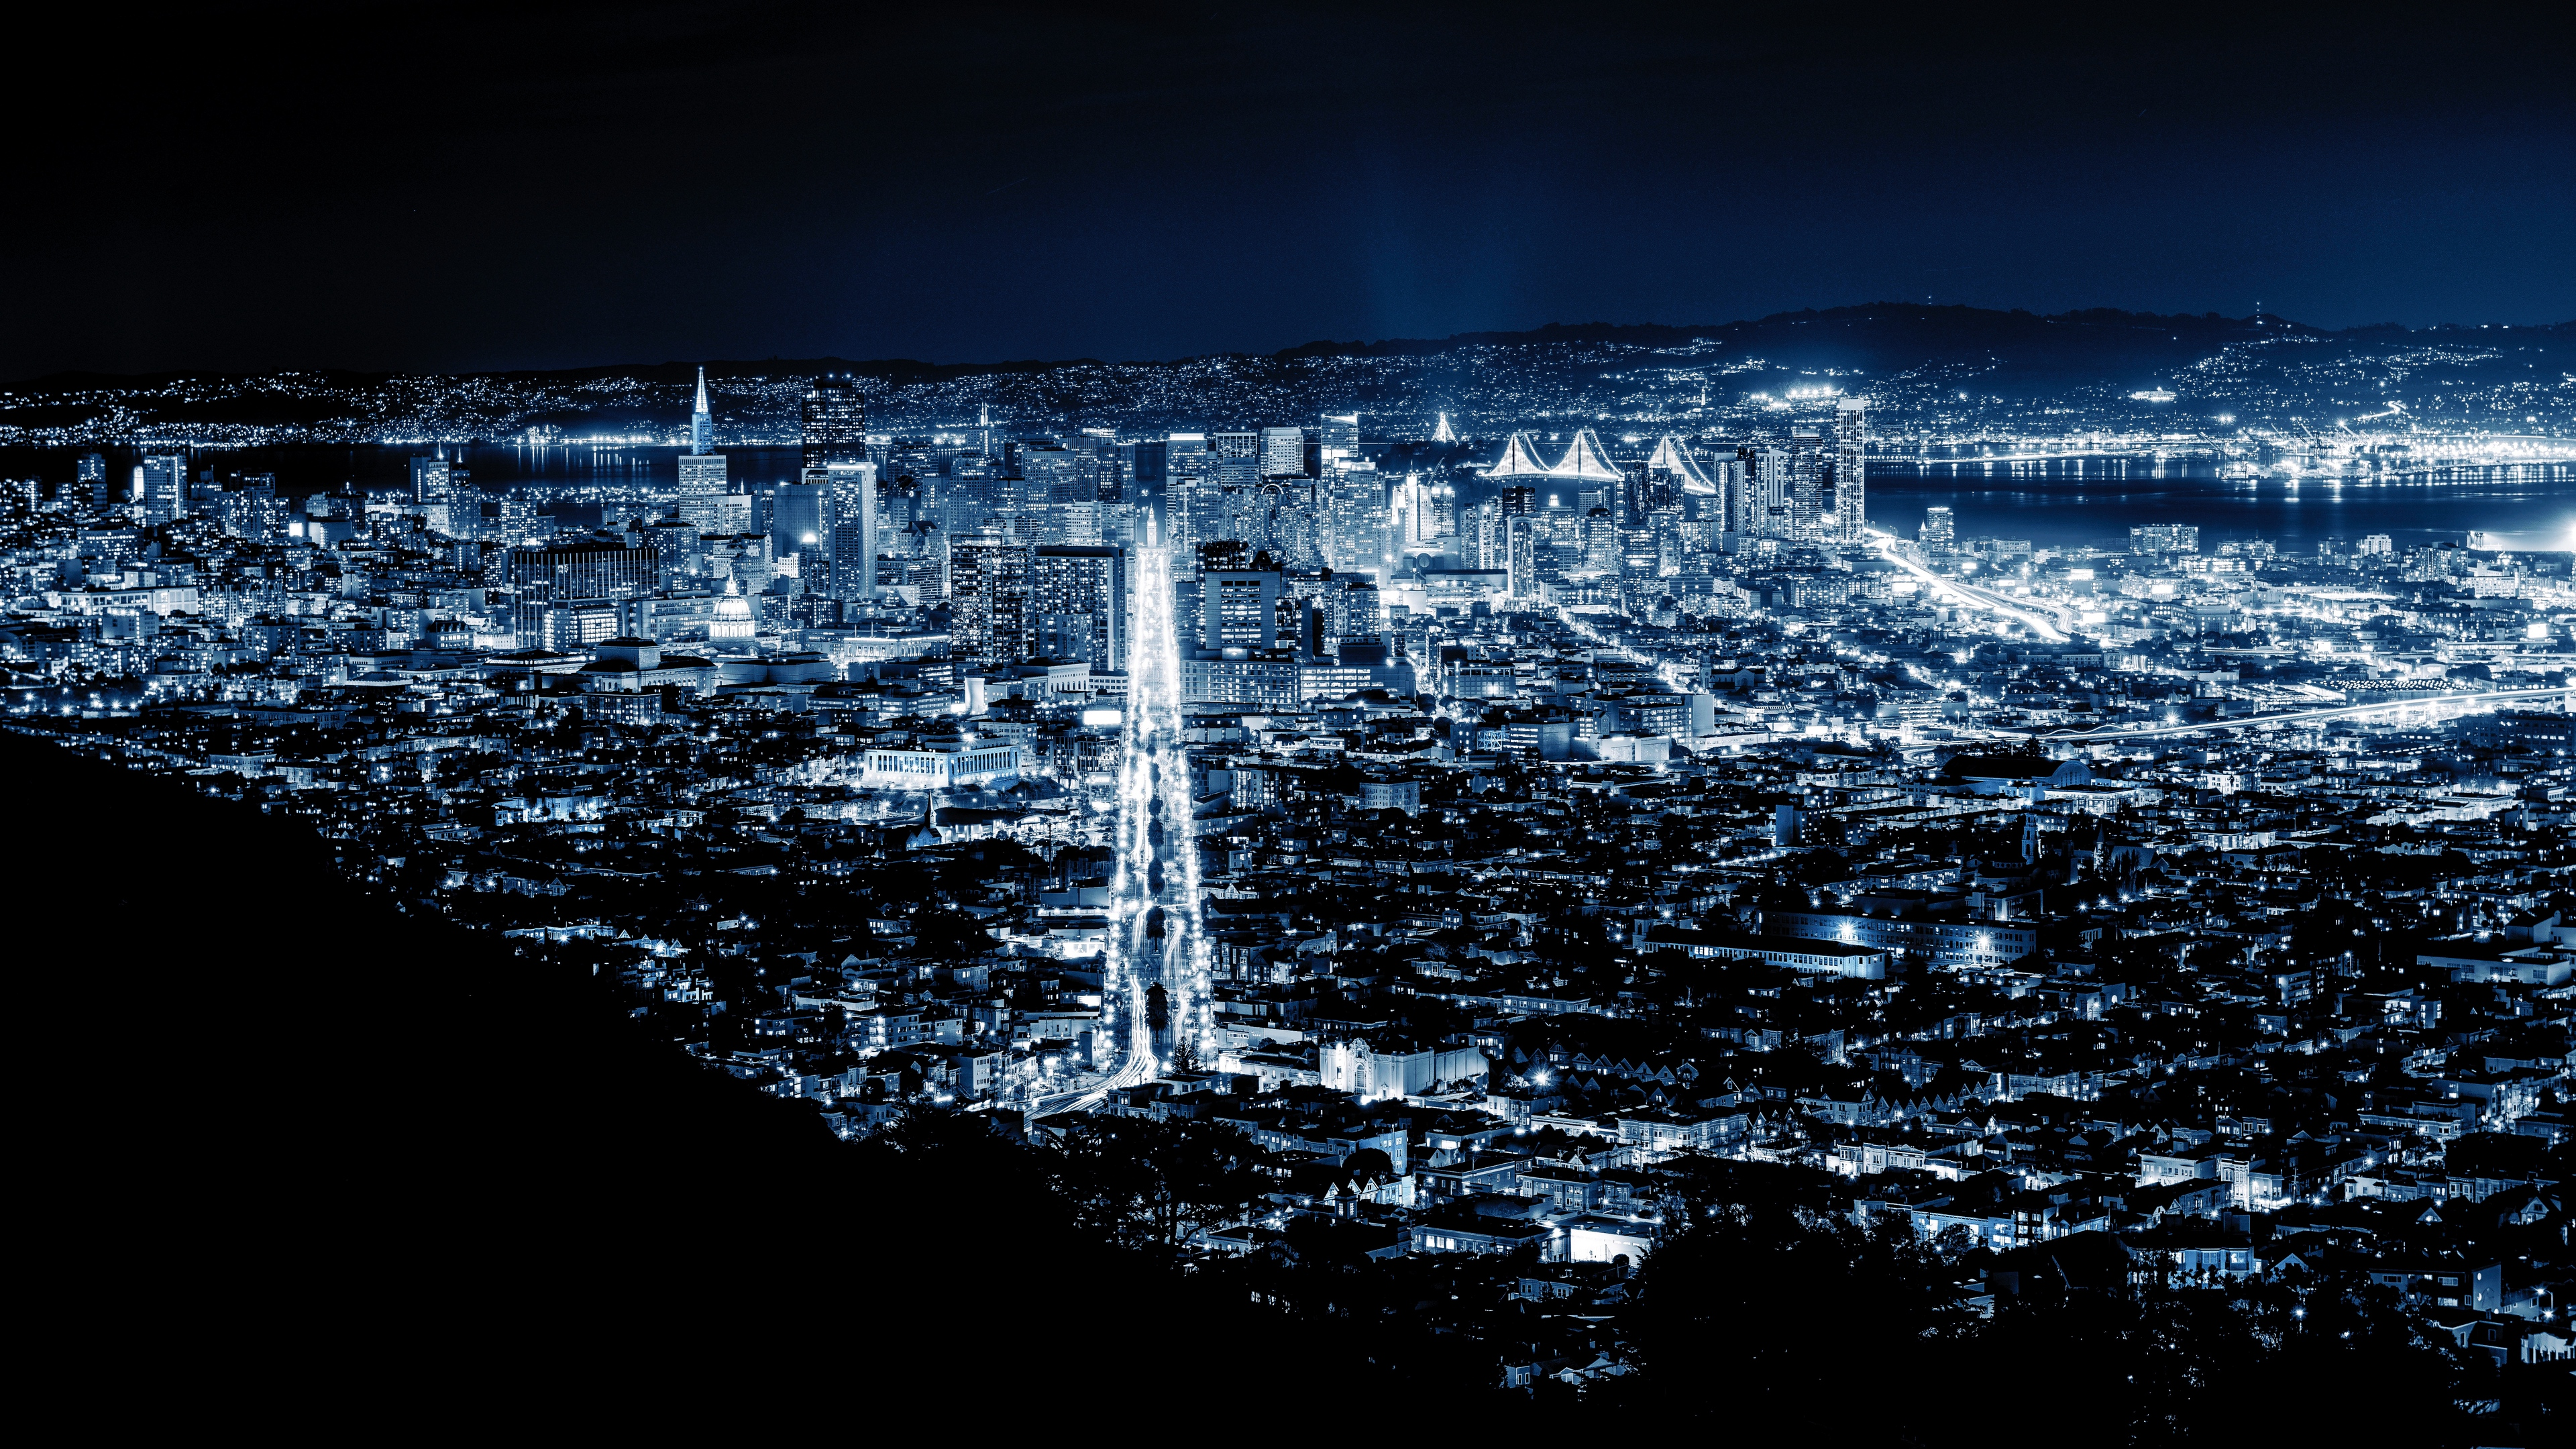 night city city lights san francisco united states 4k 1538067566 - night city, city lights, san francisco, united states 4k - san francisco, night city, city lights